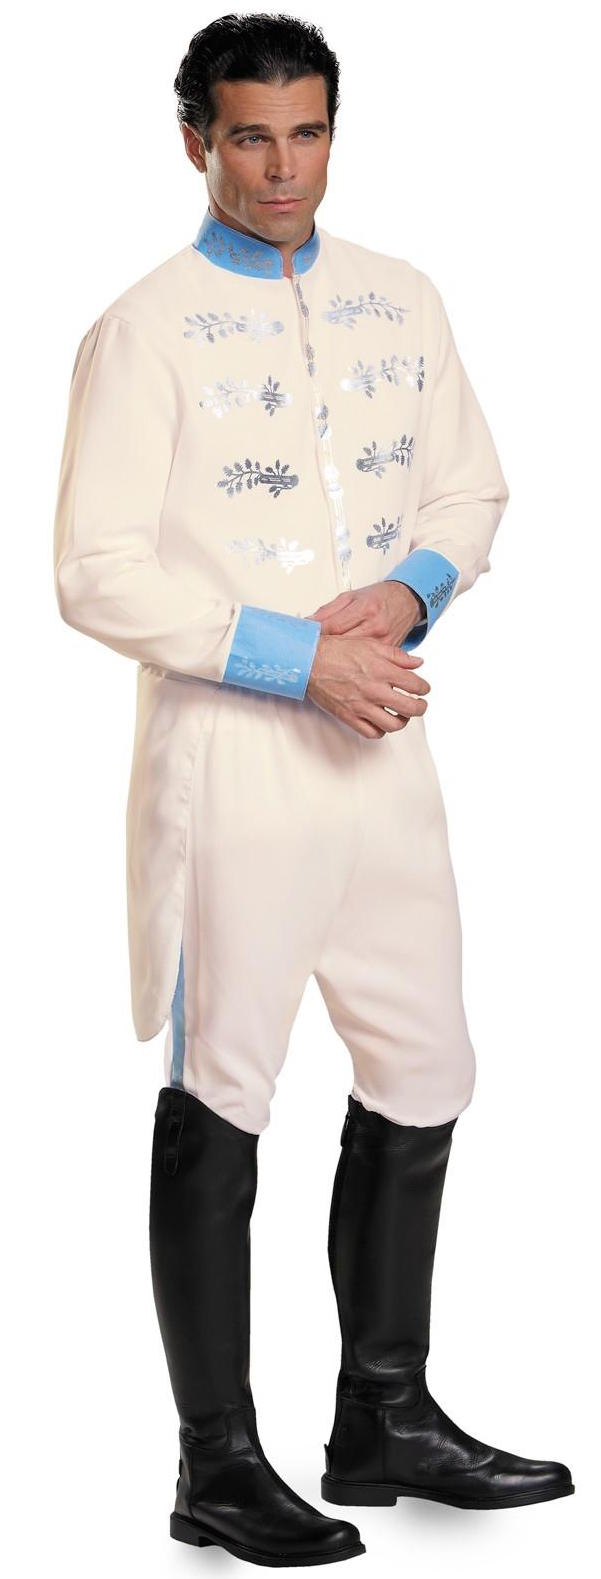 Disney Cinderella-Prince Charming-Costume